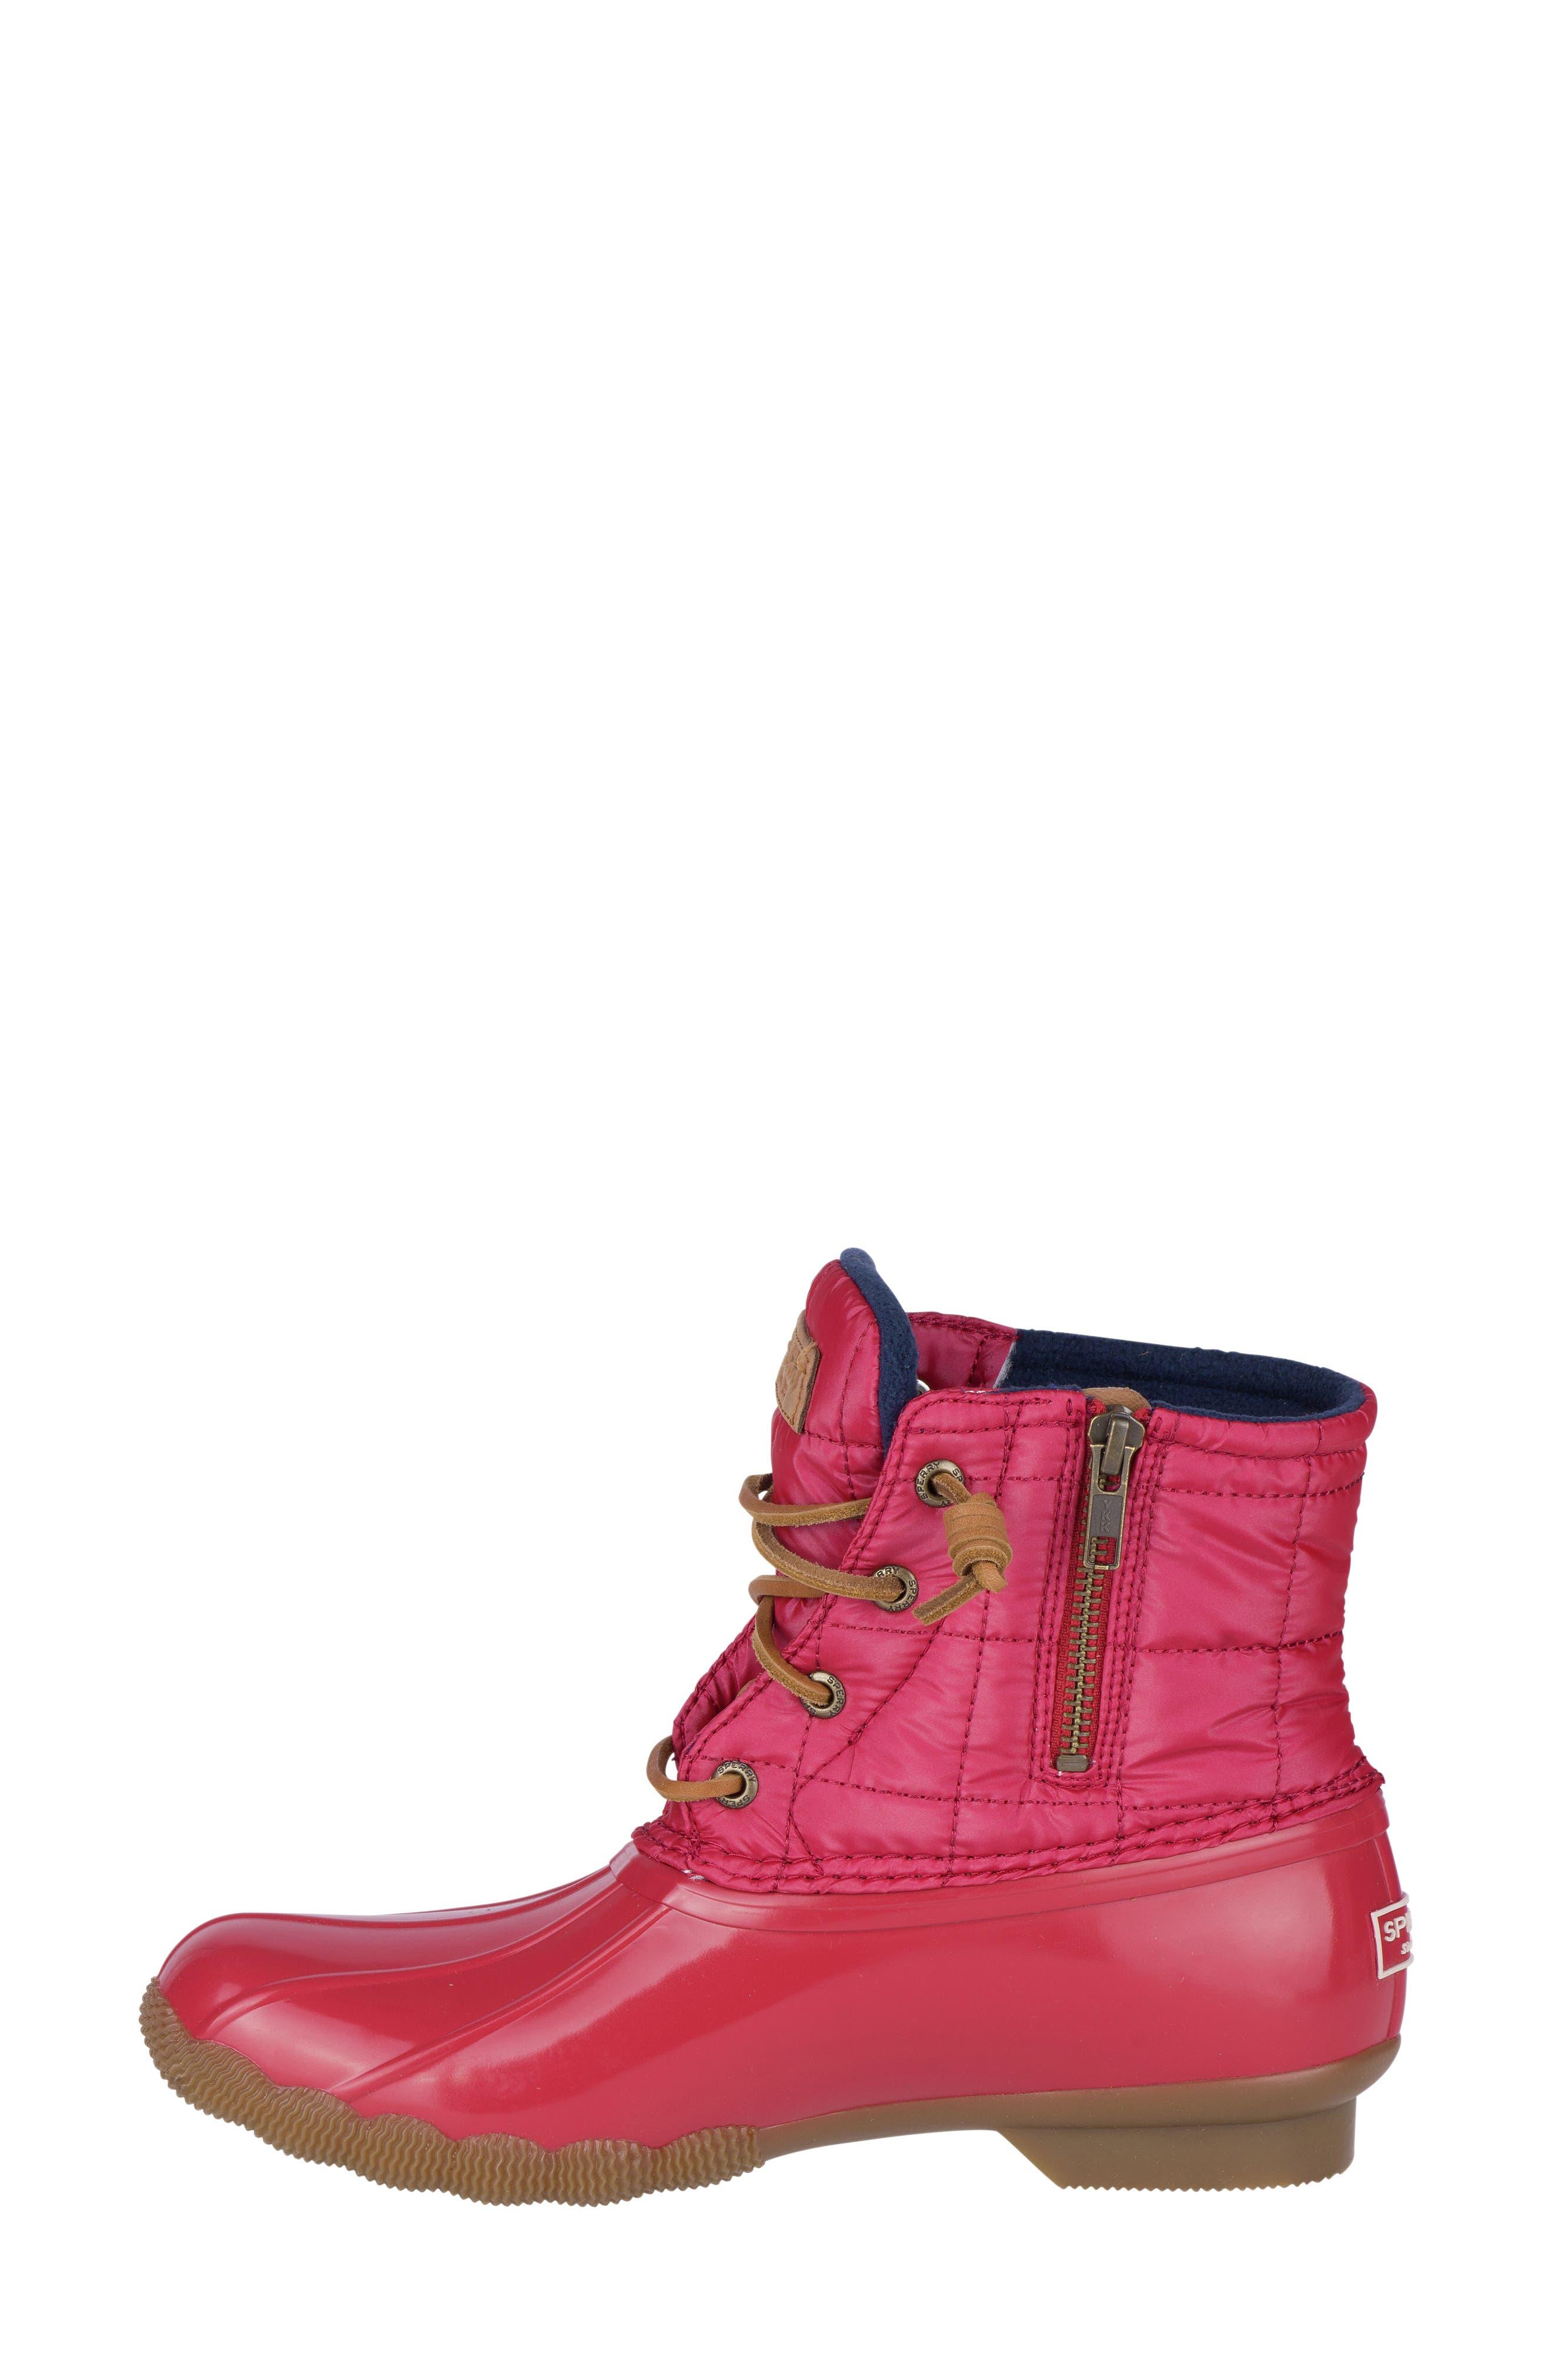 'Saltwater' Waterproof Rain Boot,                             Alternate thumbnail 76, color,